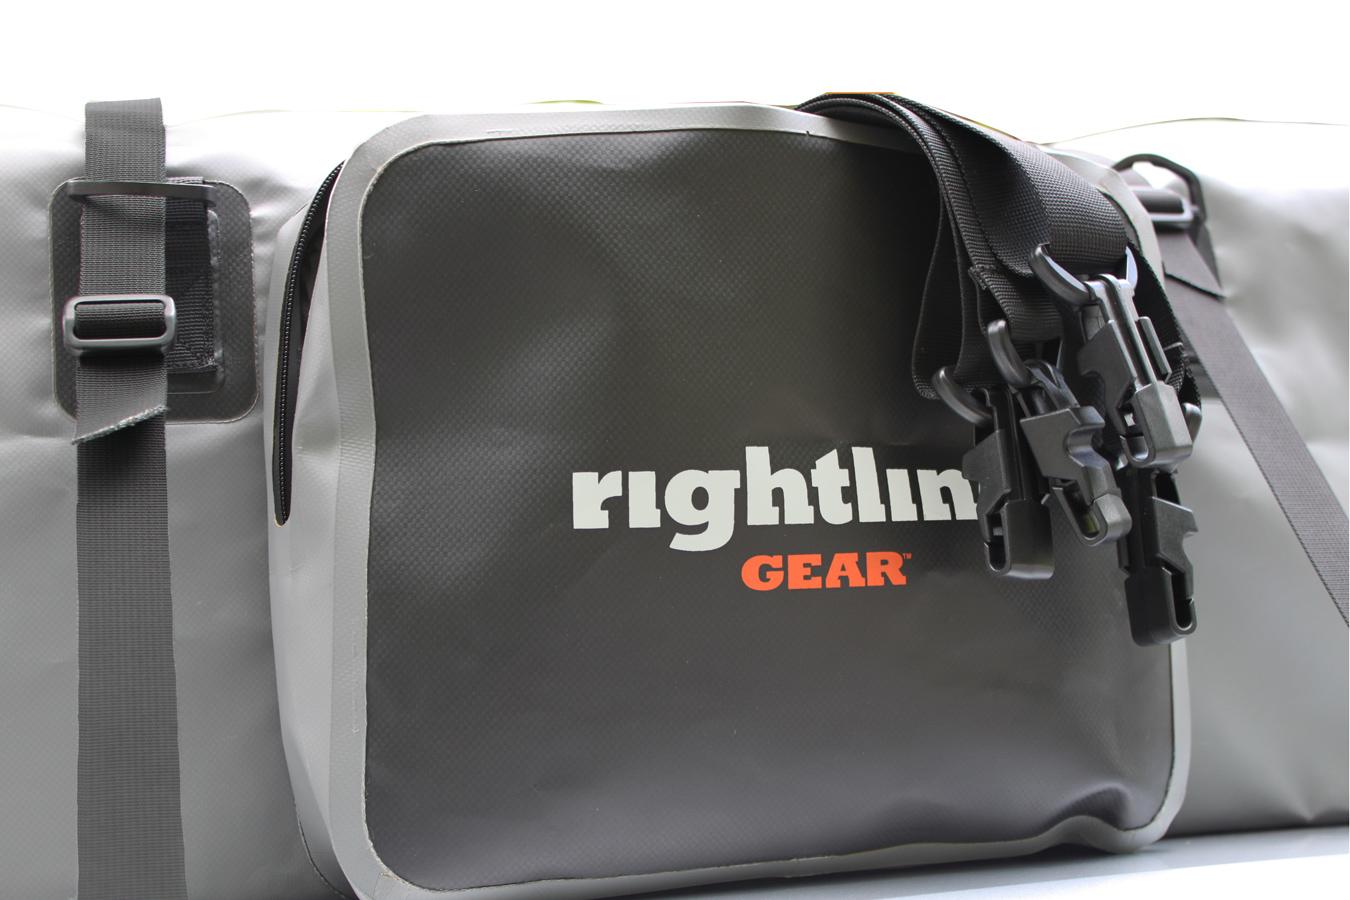 Rightline Gear 4x4 Duffle Bag Free Shipping On